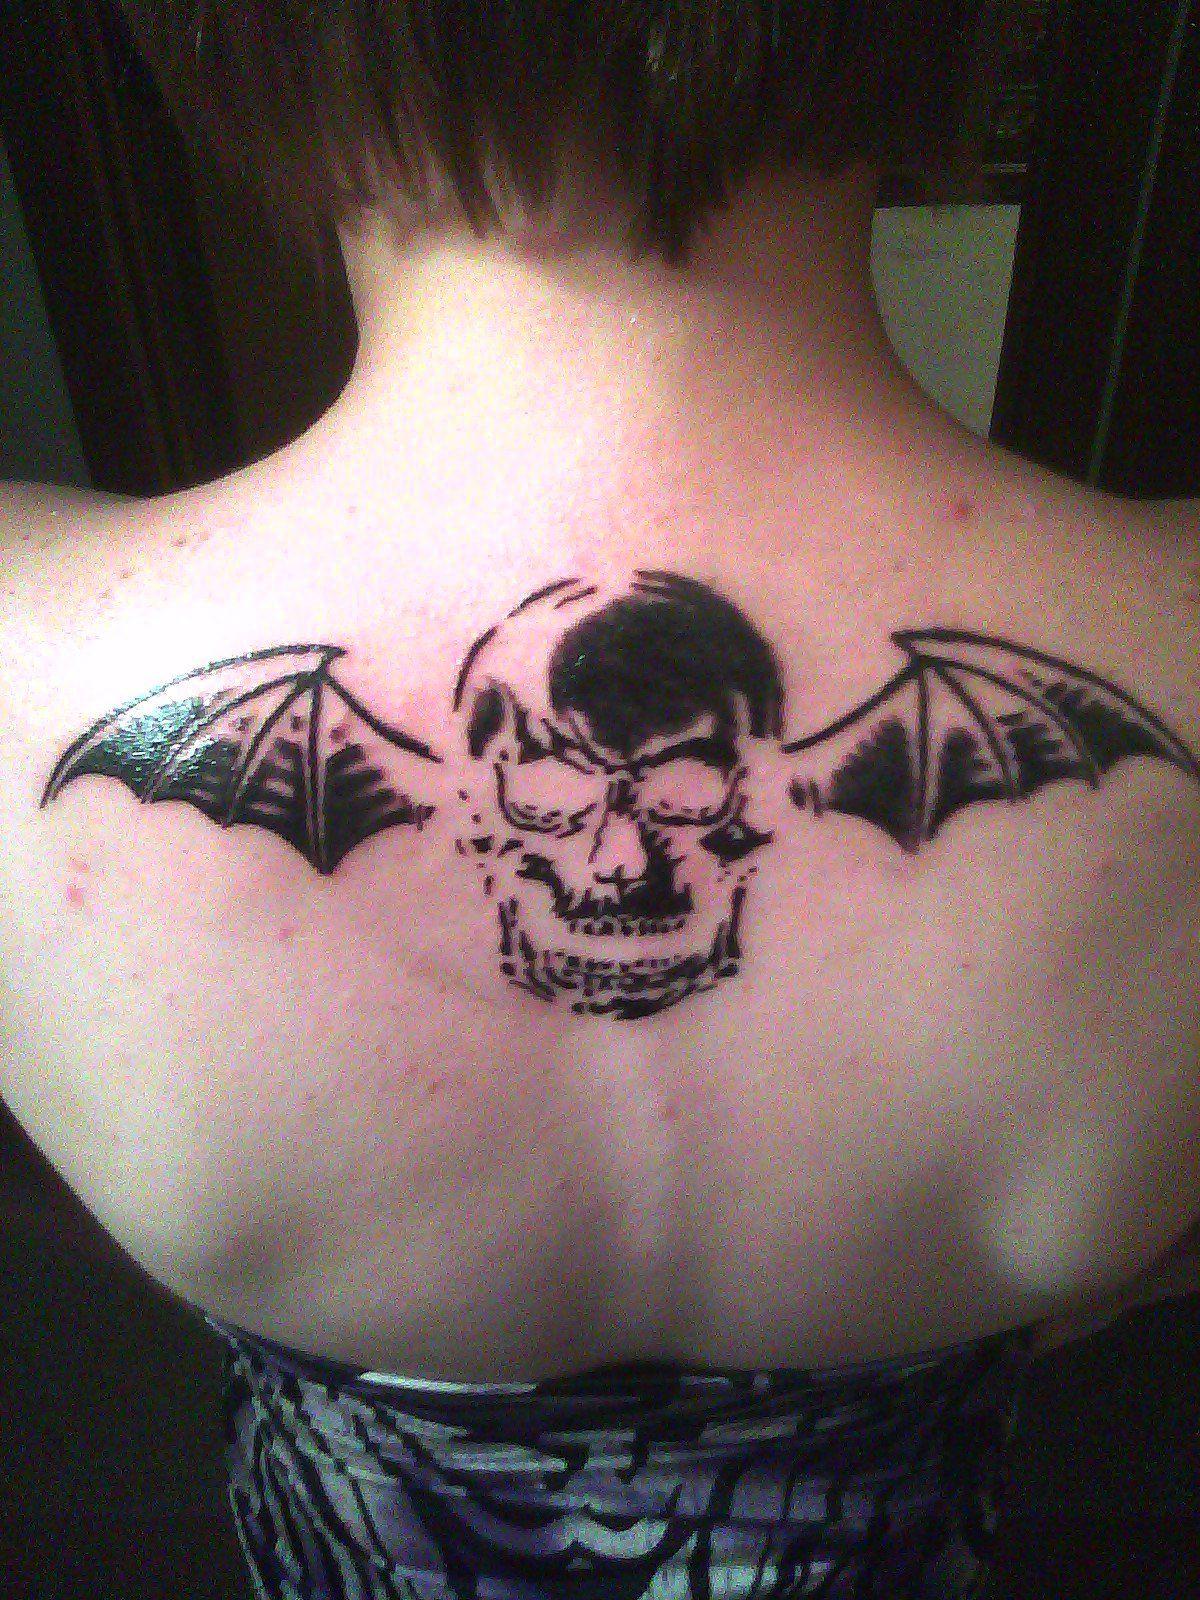 Av av avenged sevenfold tattoo designs - Avenged Sevenfold Death Bat Tattoo Gotta Love It